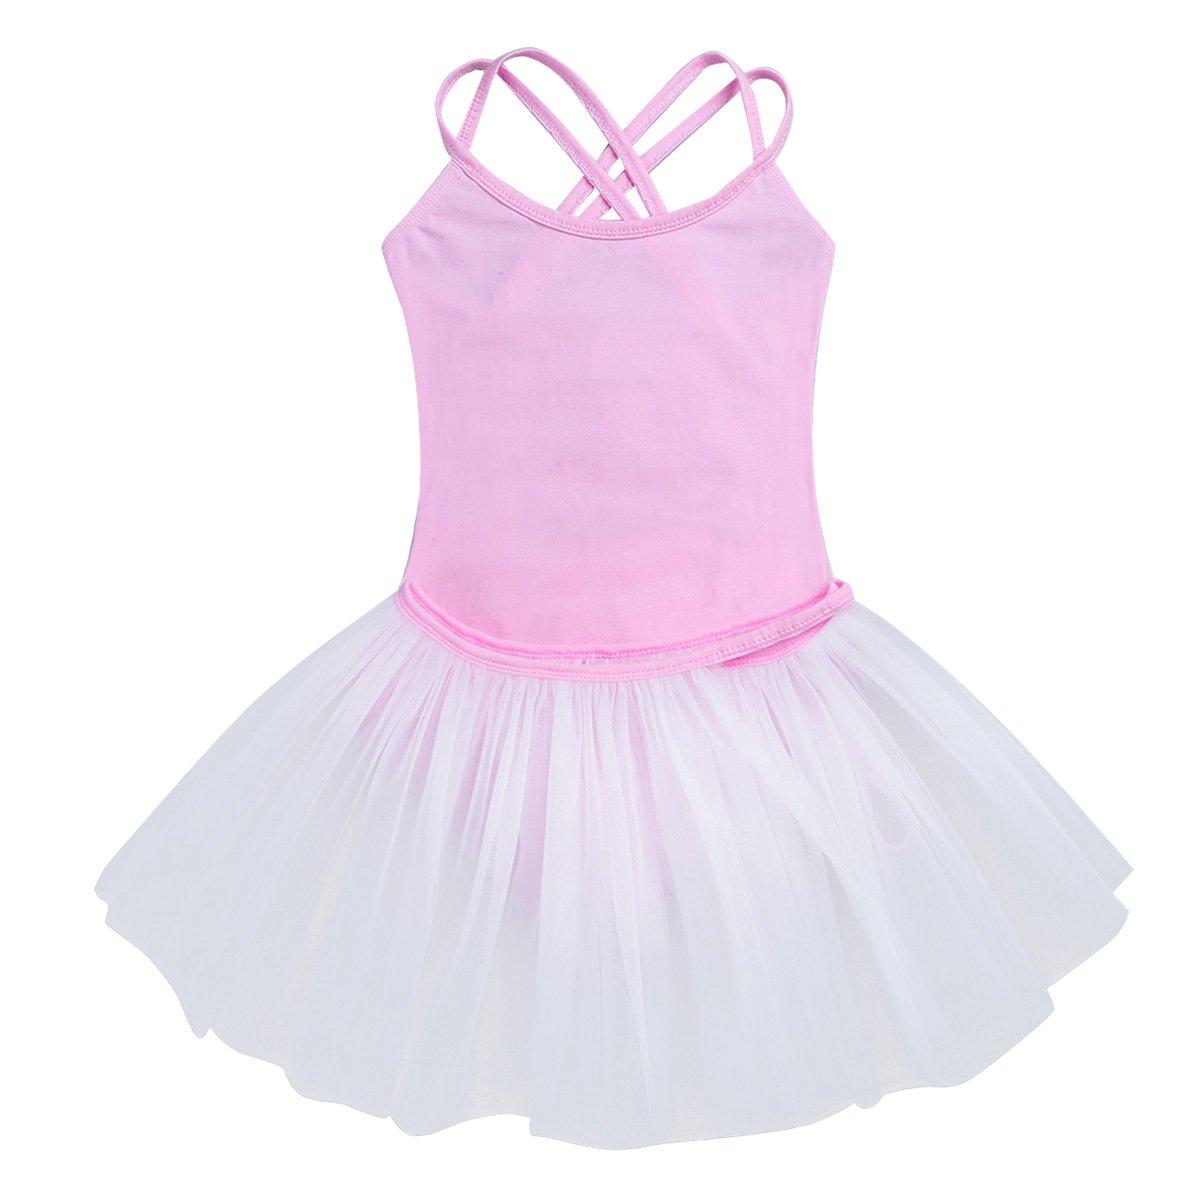 Pink&white Freebily Girls Leotard with Tutu Skirt Ballet Dance Dress 2pcs for Gymnastics Dancing Activewear